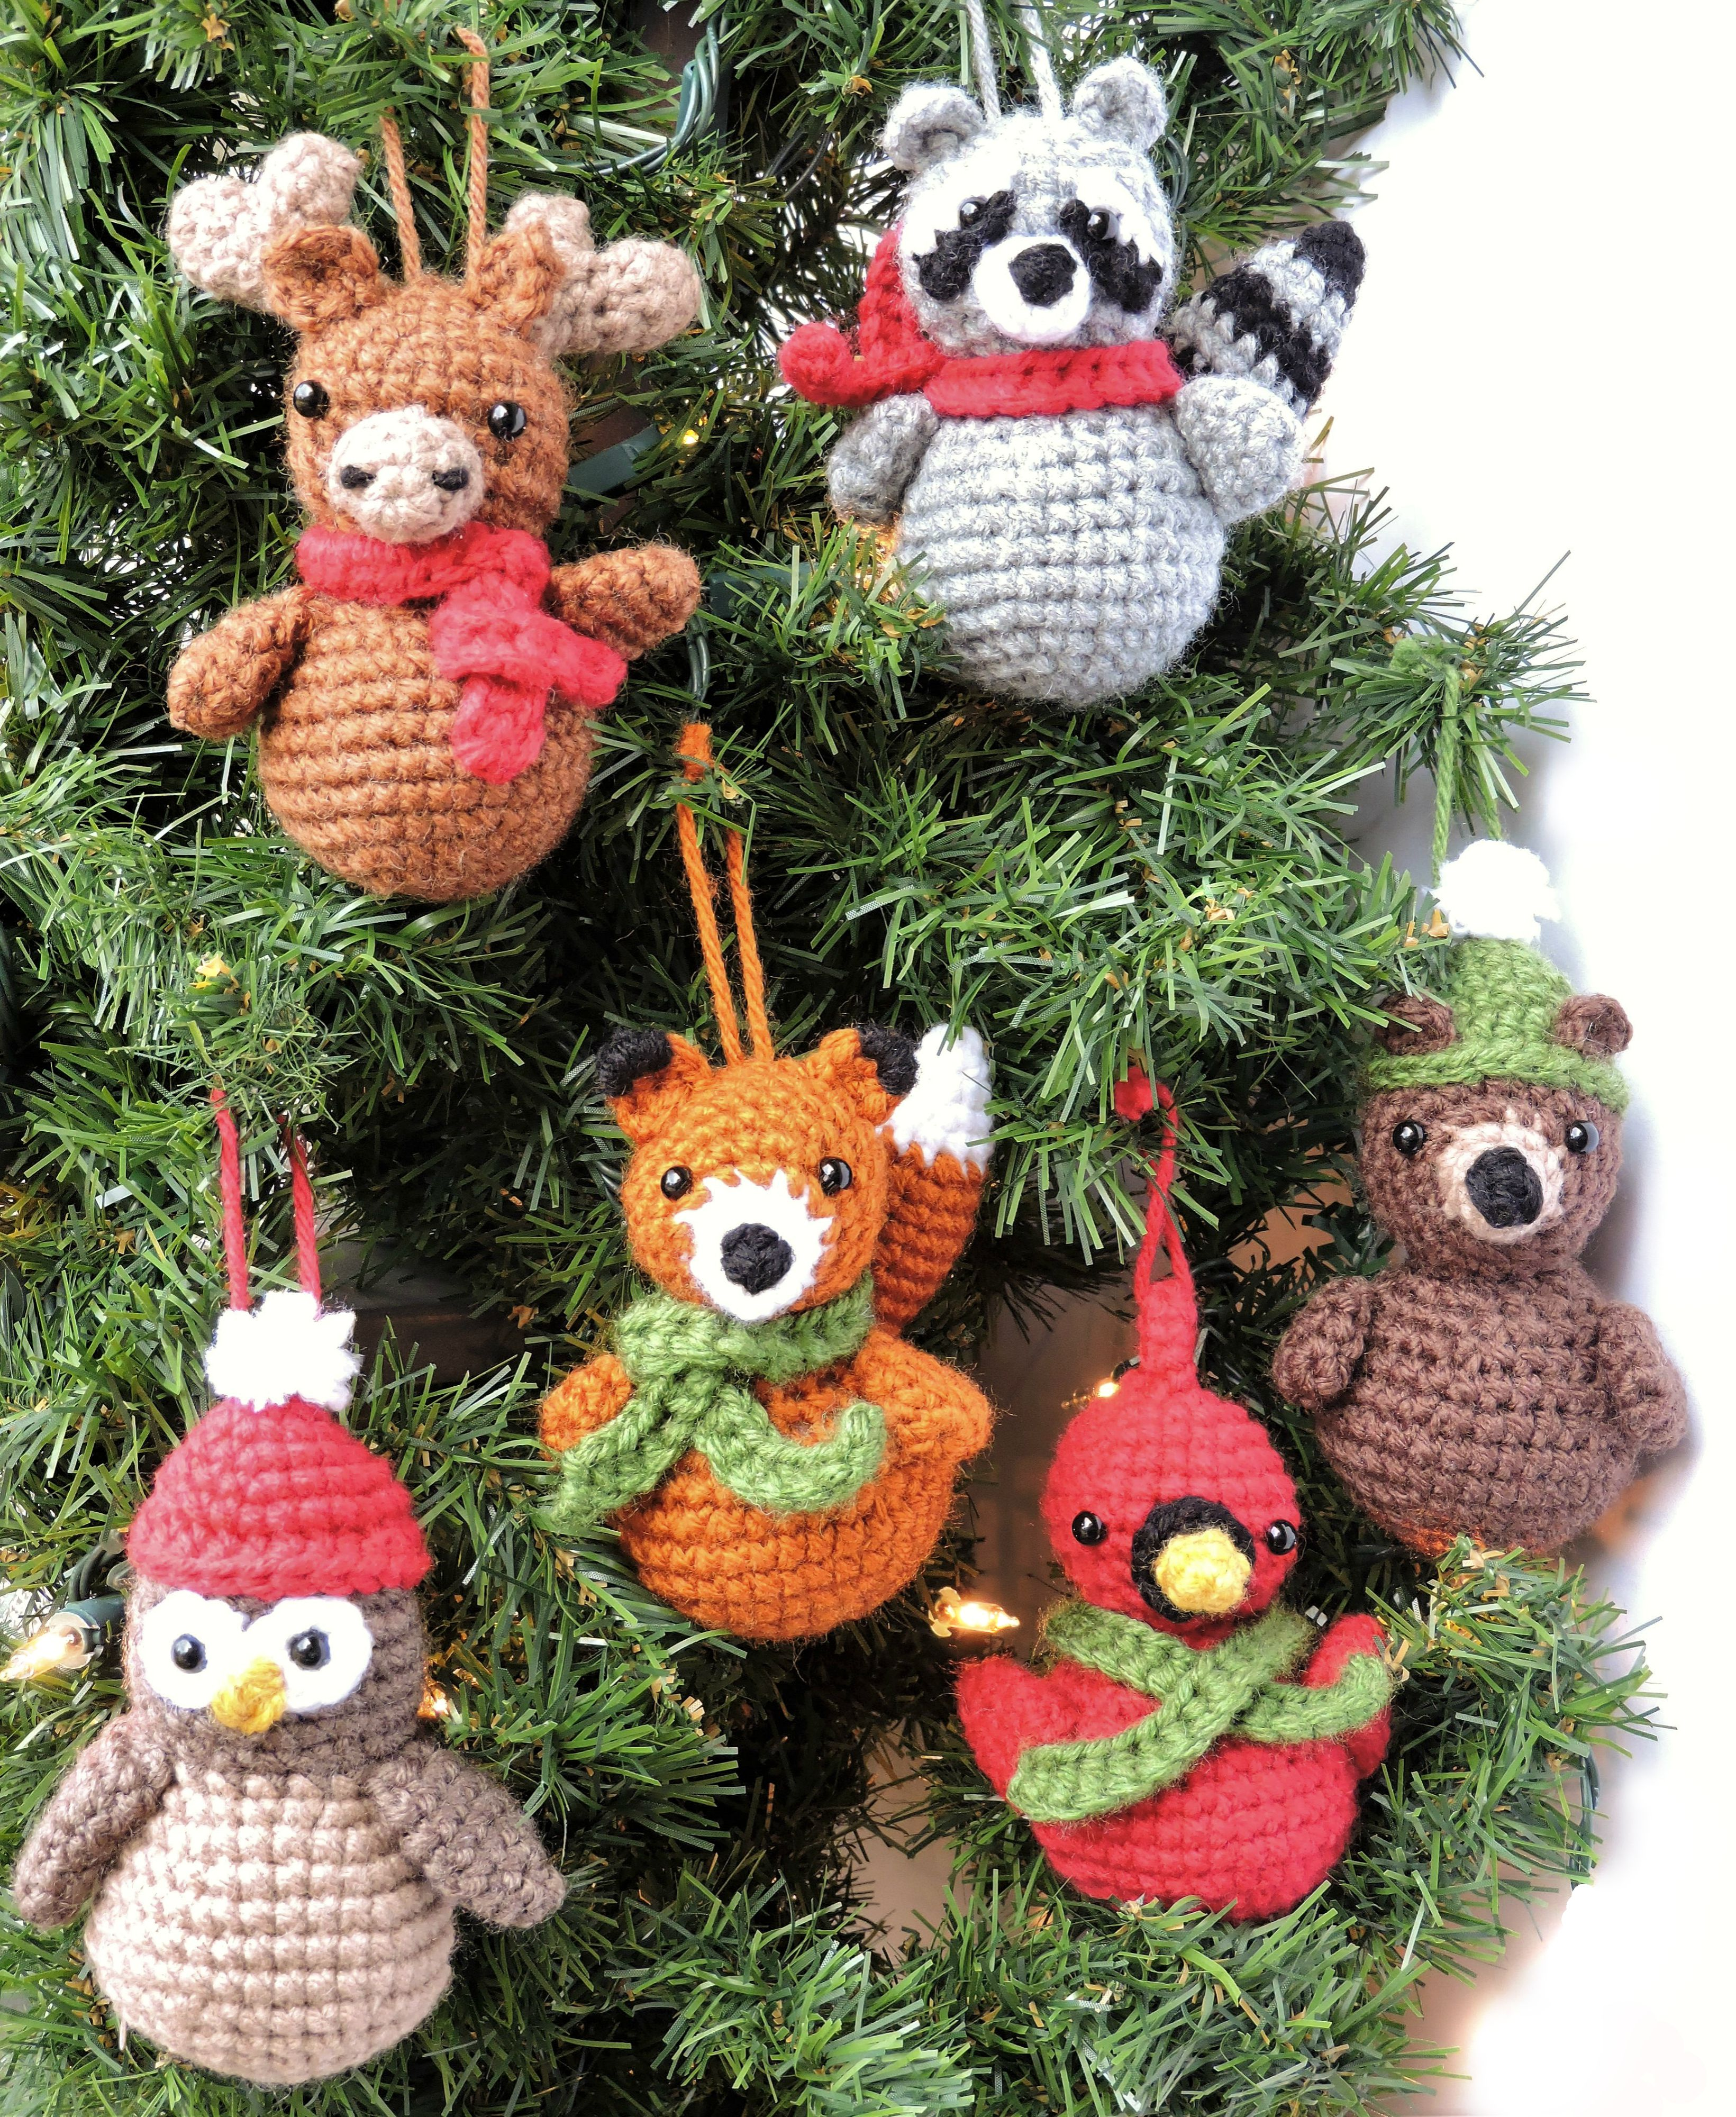 Woodland Animal Ornaments - Crochet Pattern